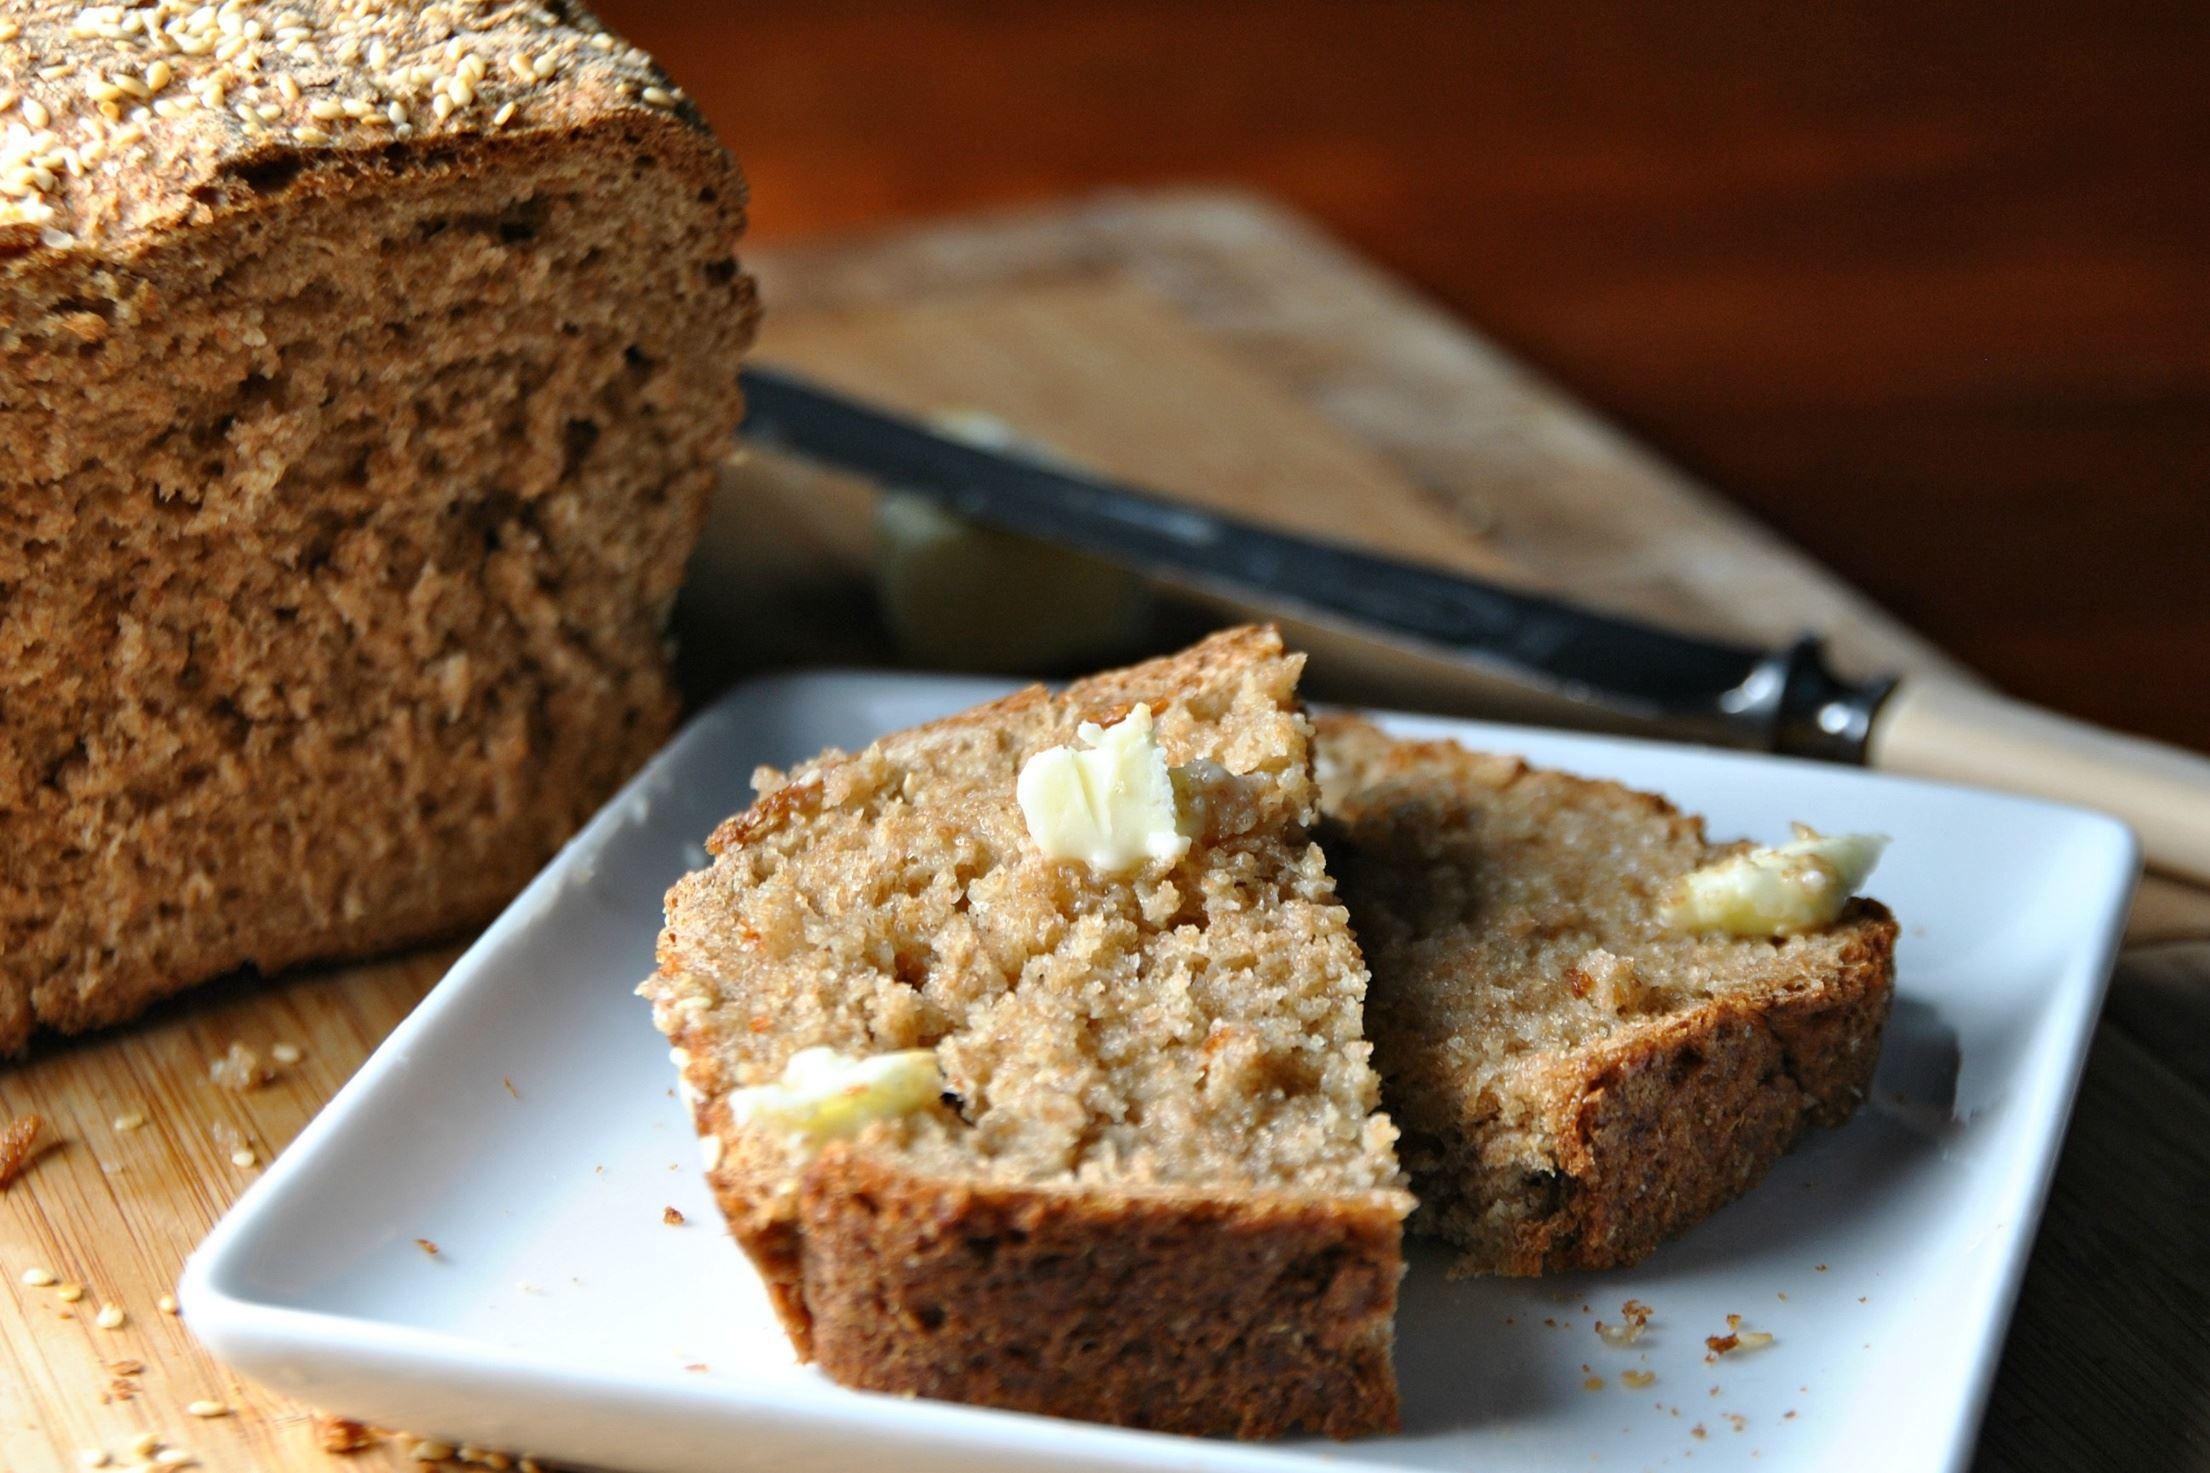 Ballymaloe Brown Yeast Bread Ballymaloe Brown Yeast Bread